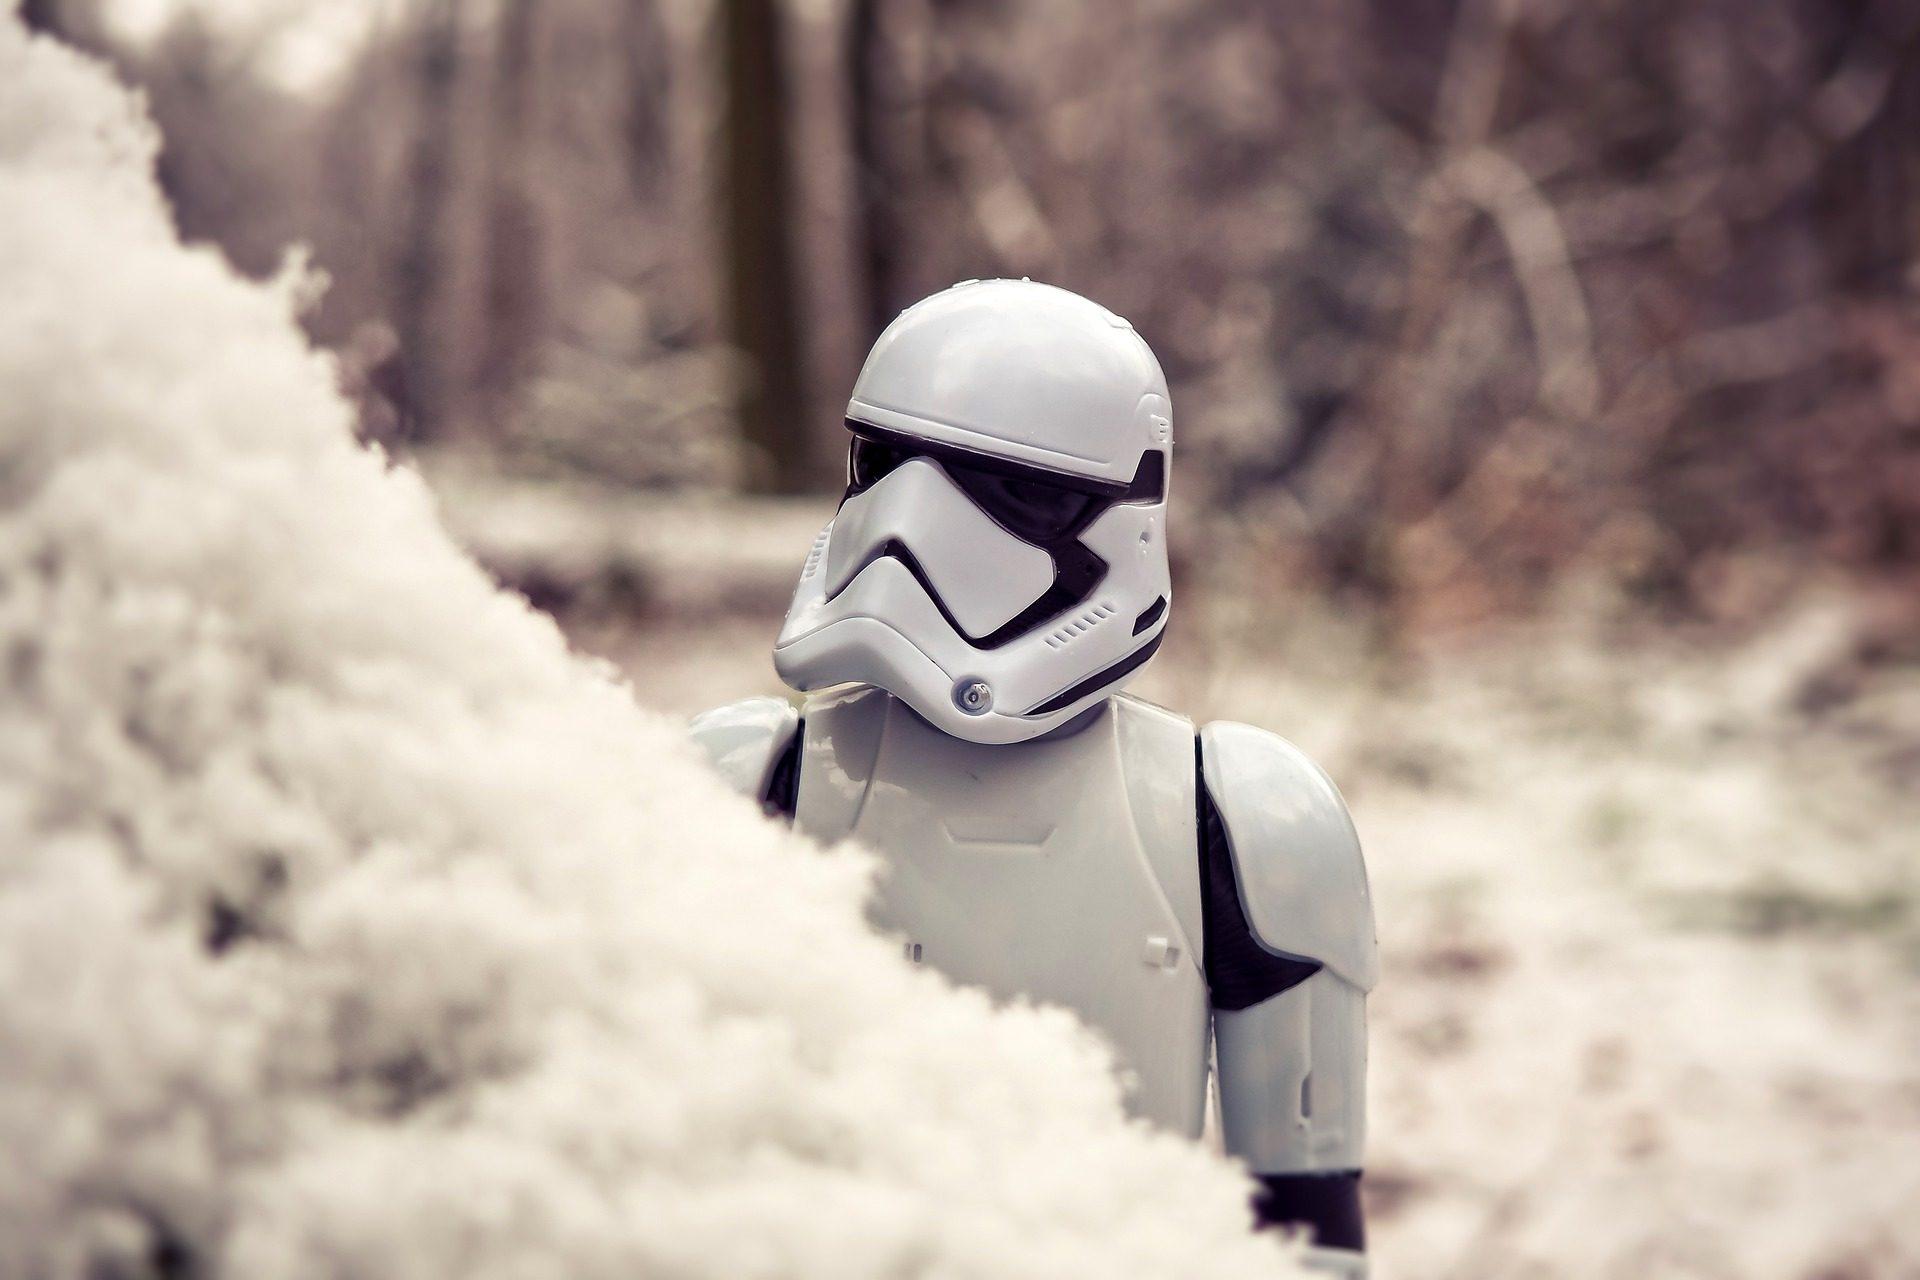 soldado, imperial, star wars, juguete, figura, nieve - Fondos de Pantalla HD - professor-falken.com